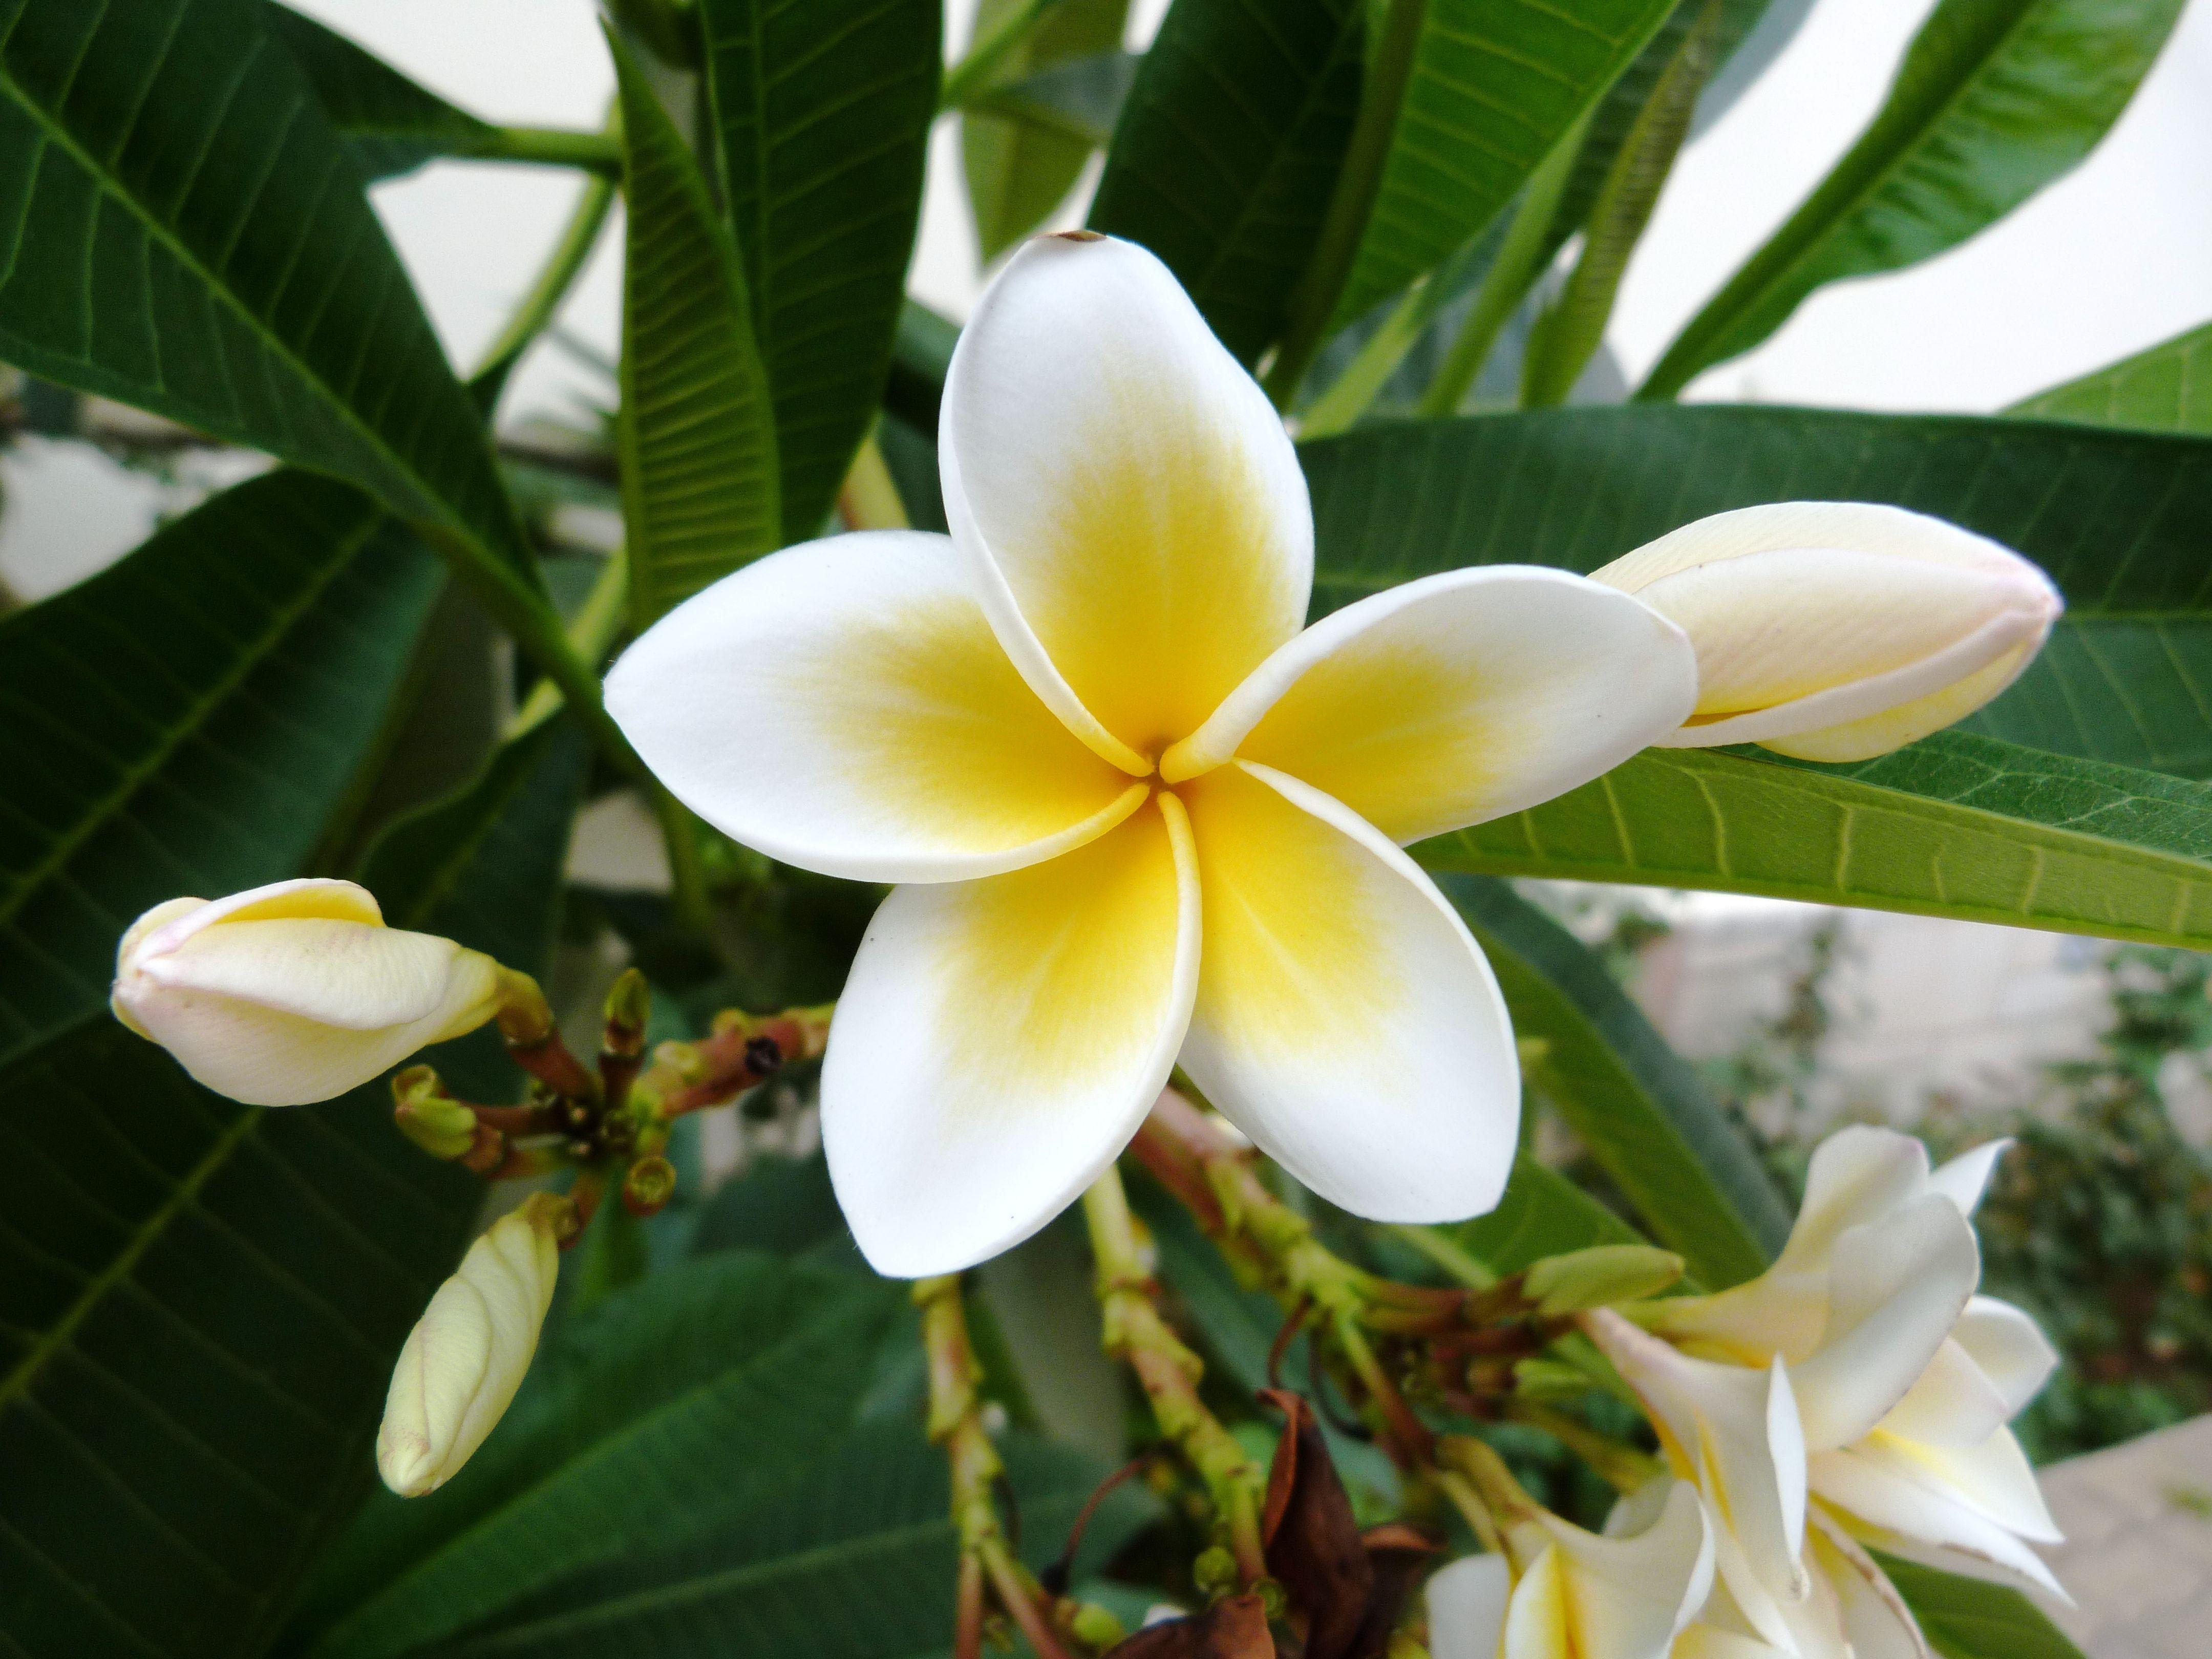 White egyptian jasminum flower on terras at anna b missiria white egyptian jasminum flower on terras at anna b missiria rethymno kreta izmirmasajfo Gallery